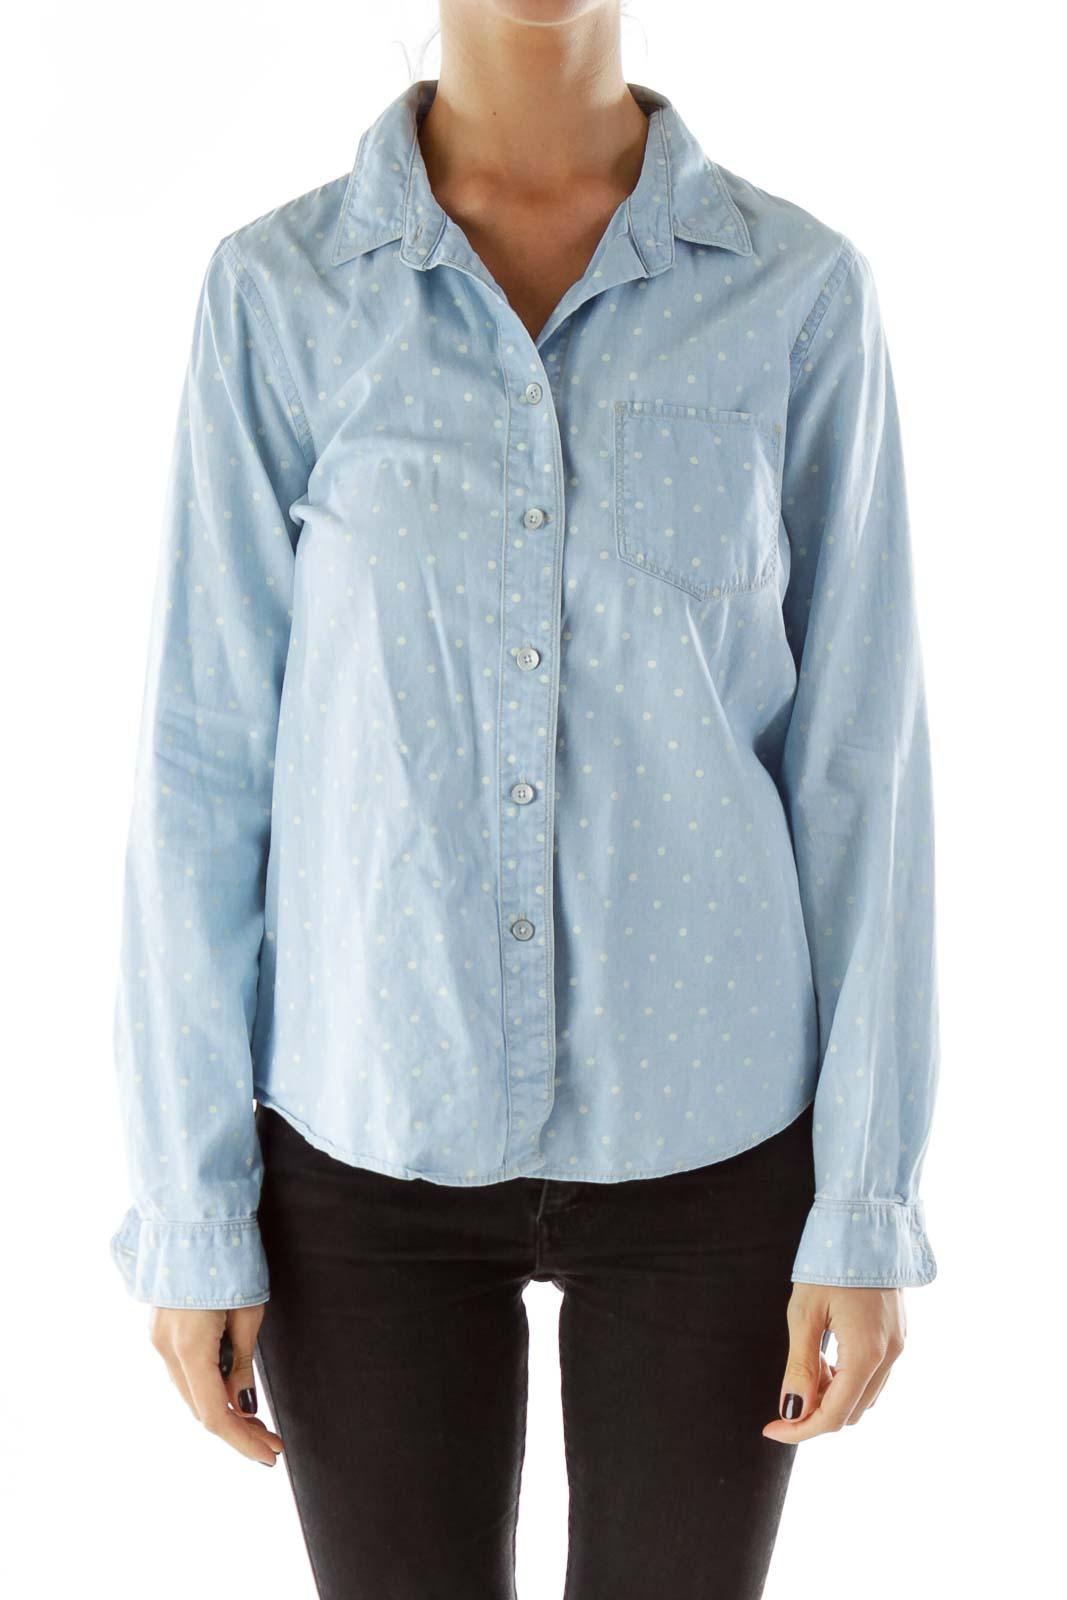 Baby Blue Polka-Dot Pocketed Cotton Shirt